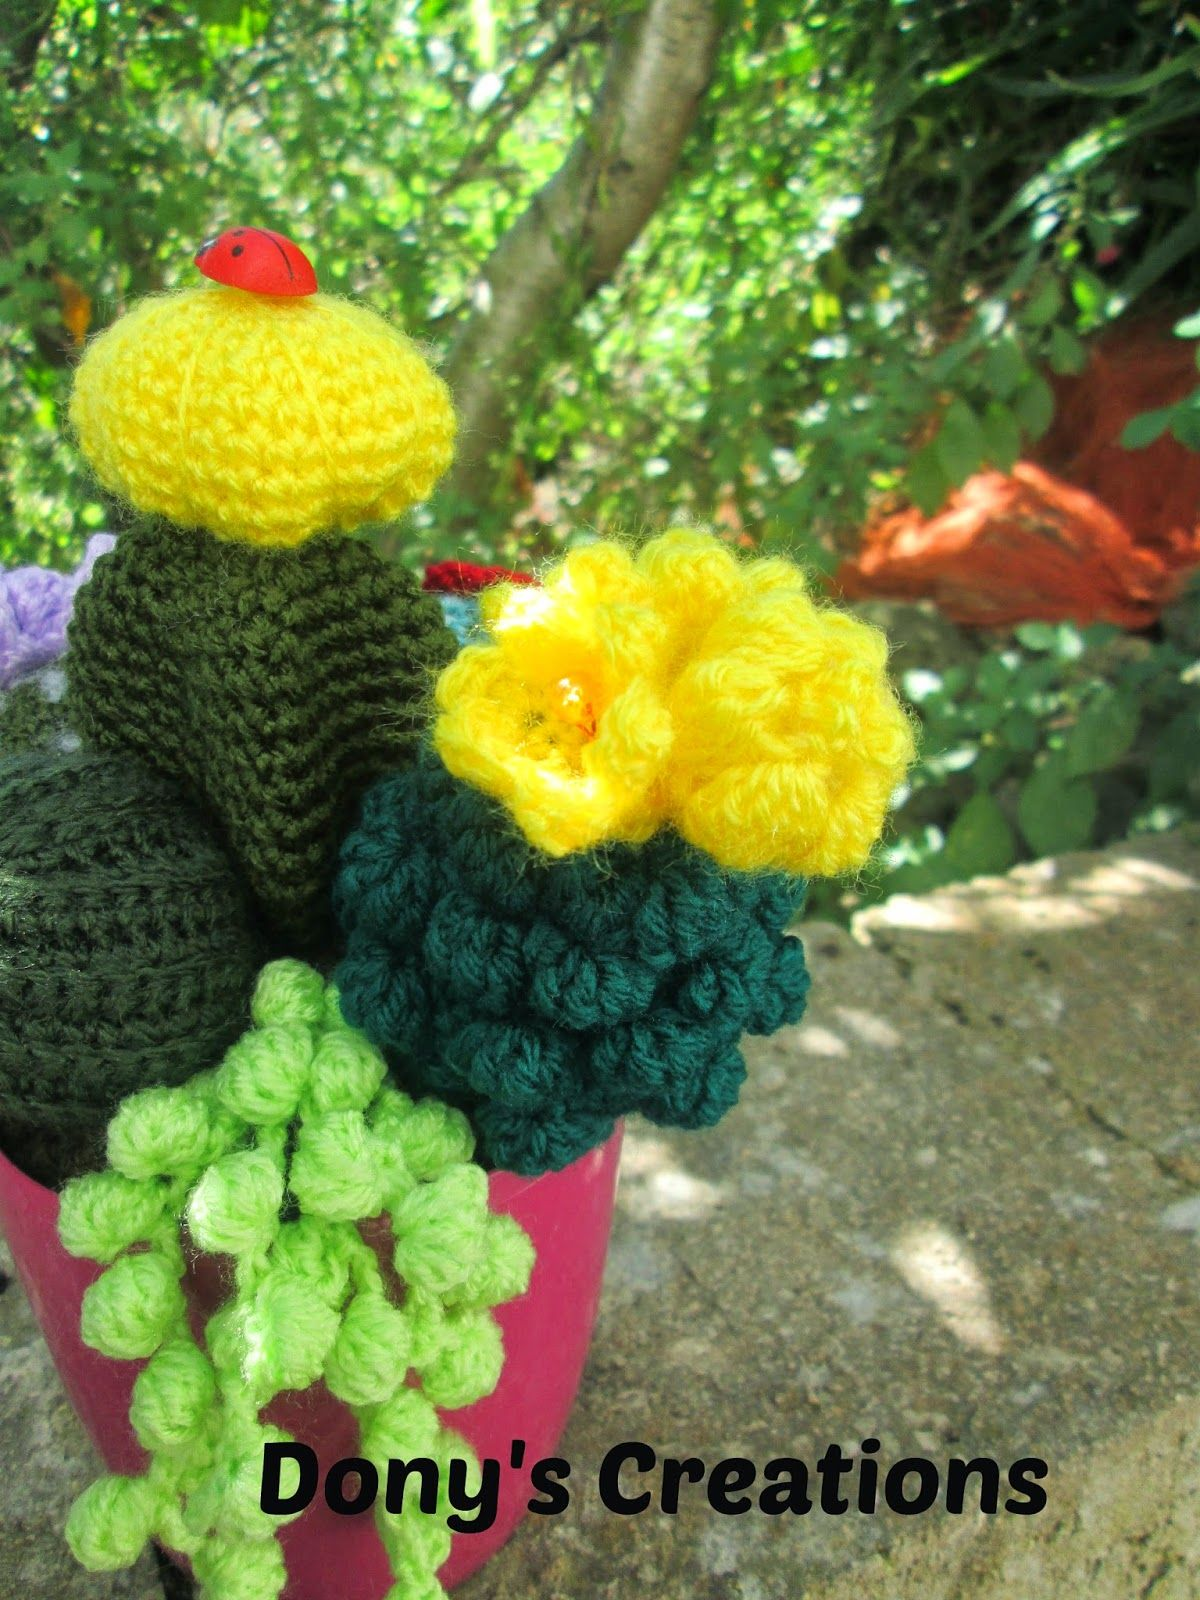 Crochet cactus _ pattern free italiano http://donyscreations ...